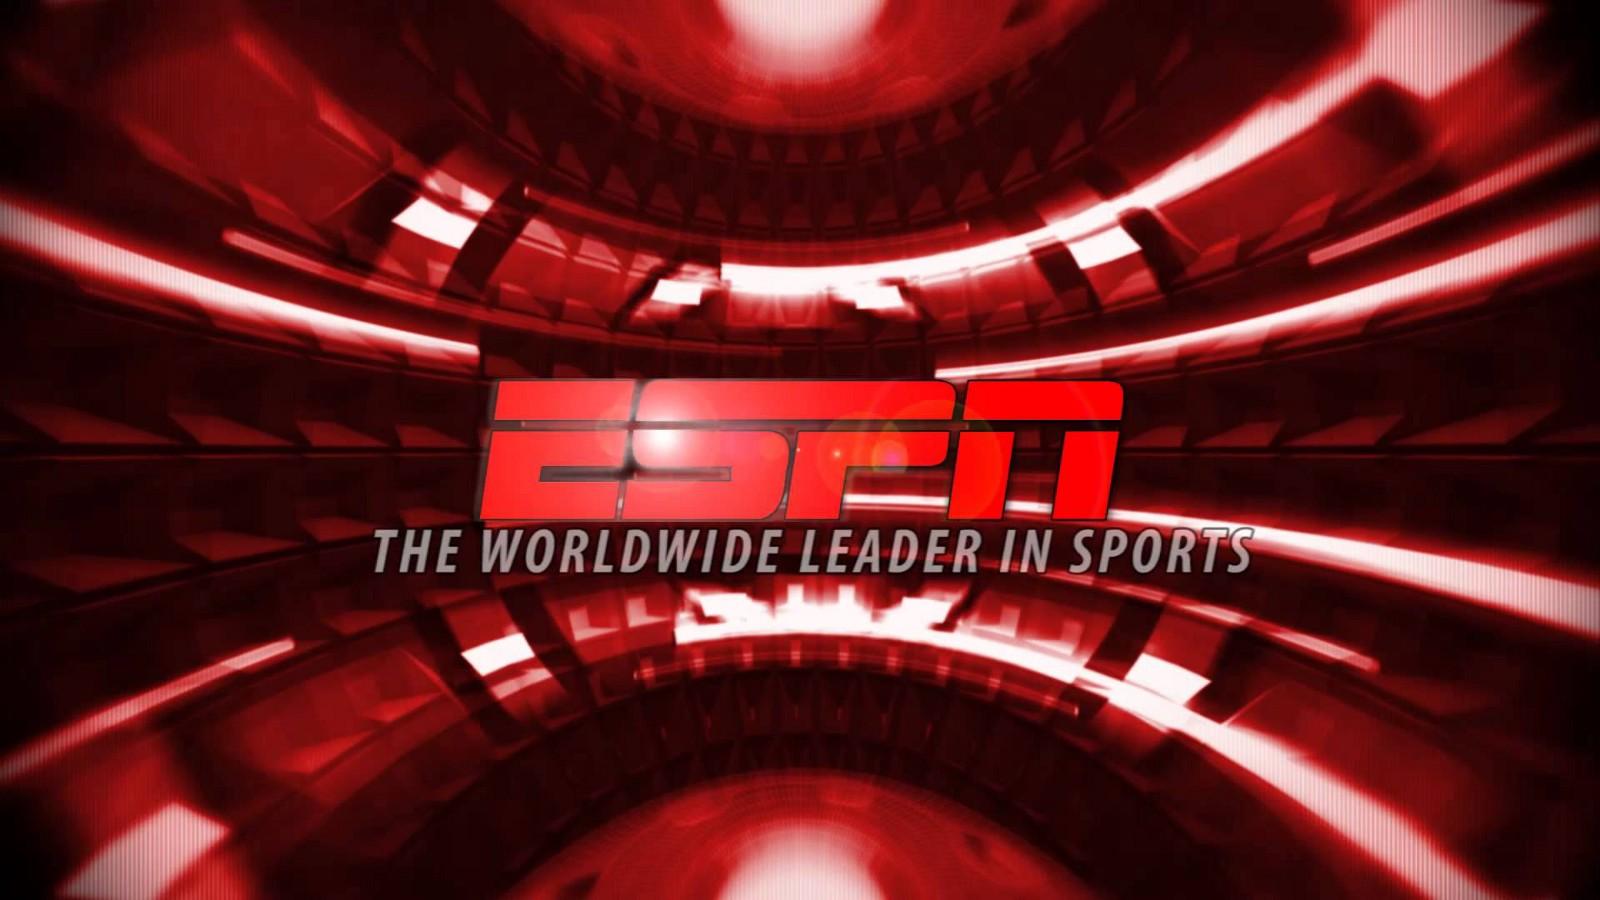 ESPN se disculpa por segmento racista